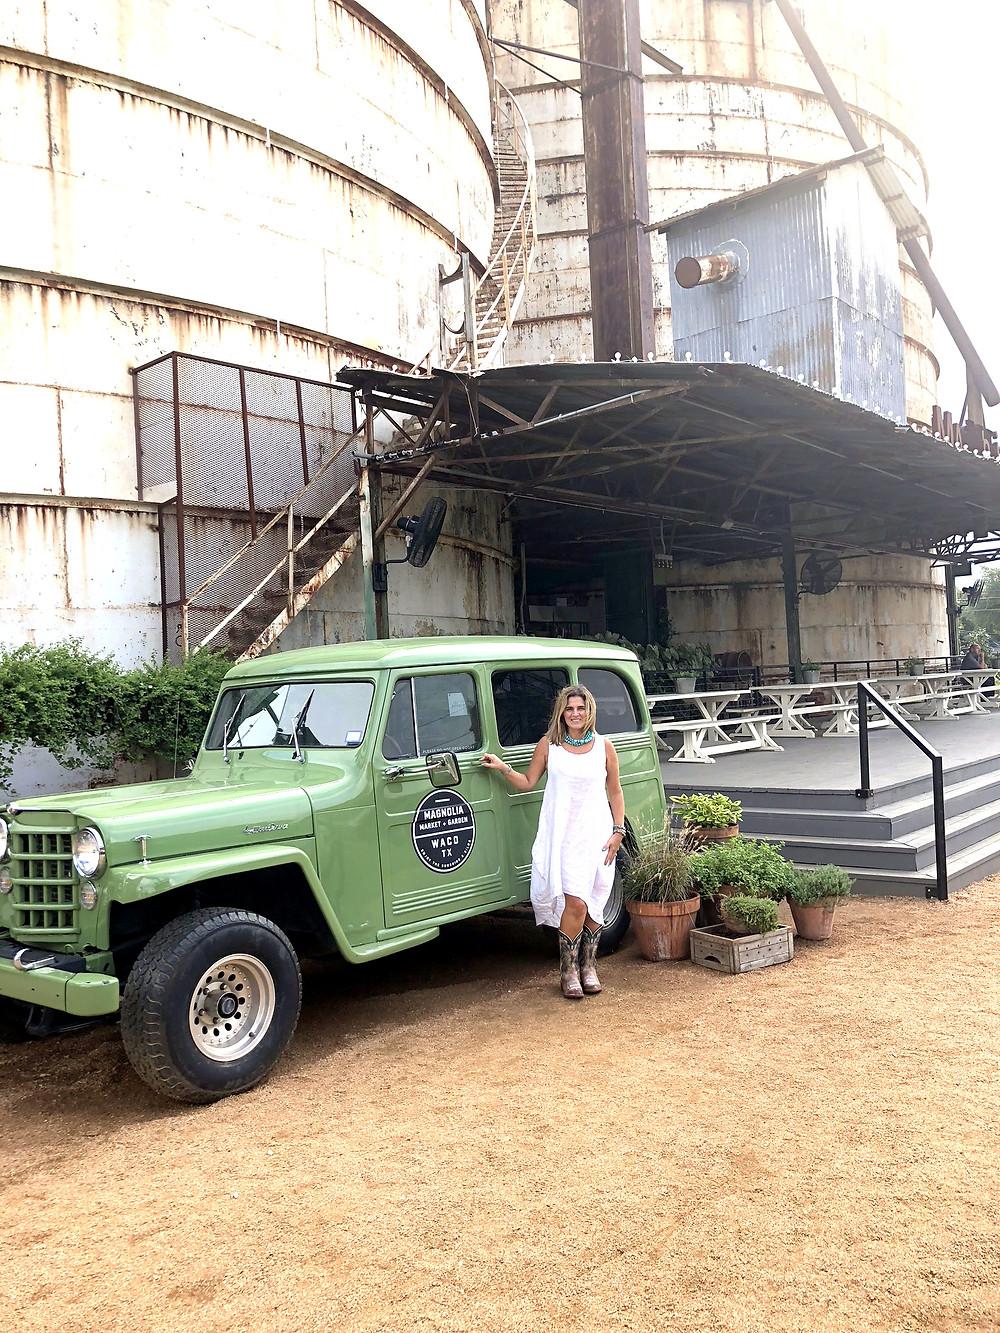 The famous Magnolia green car